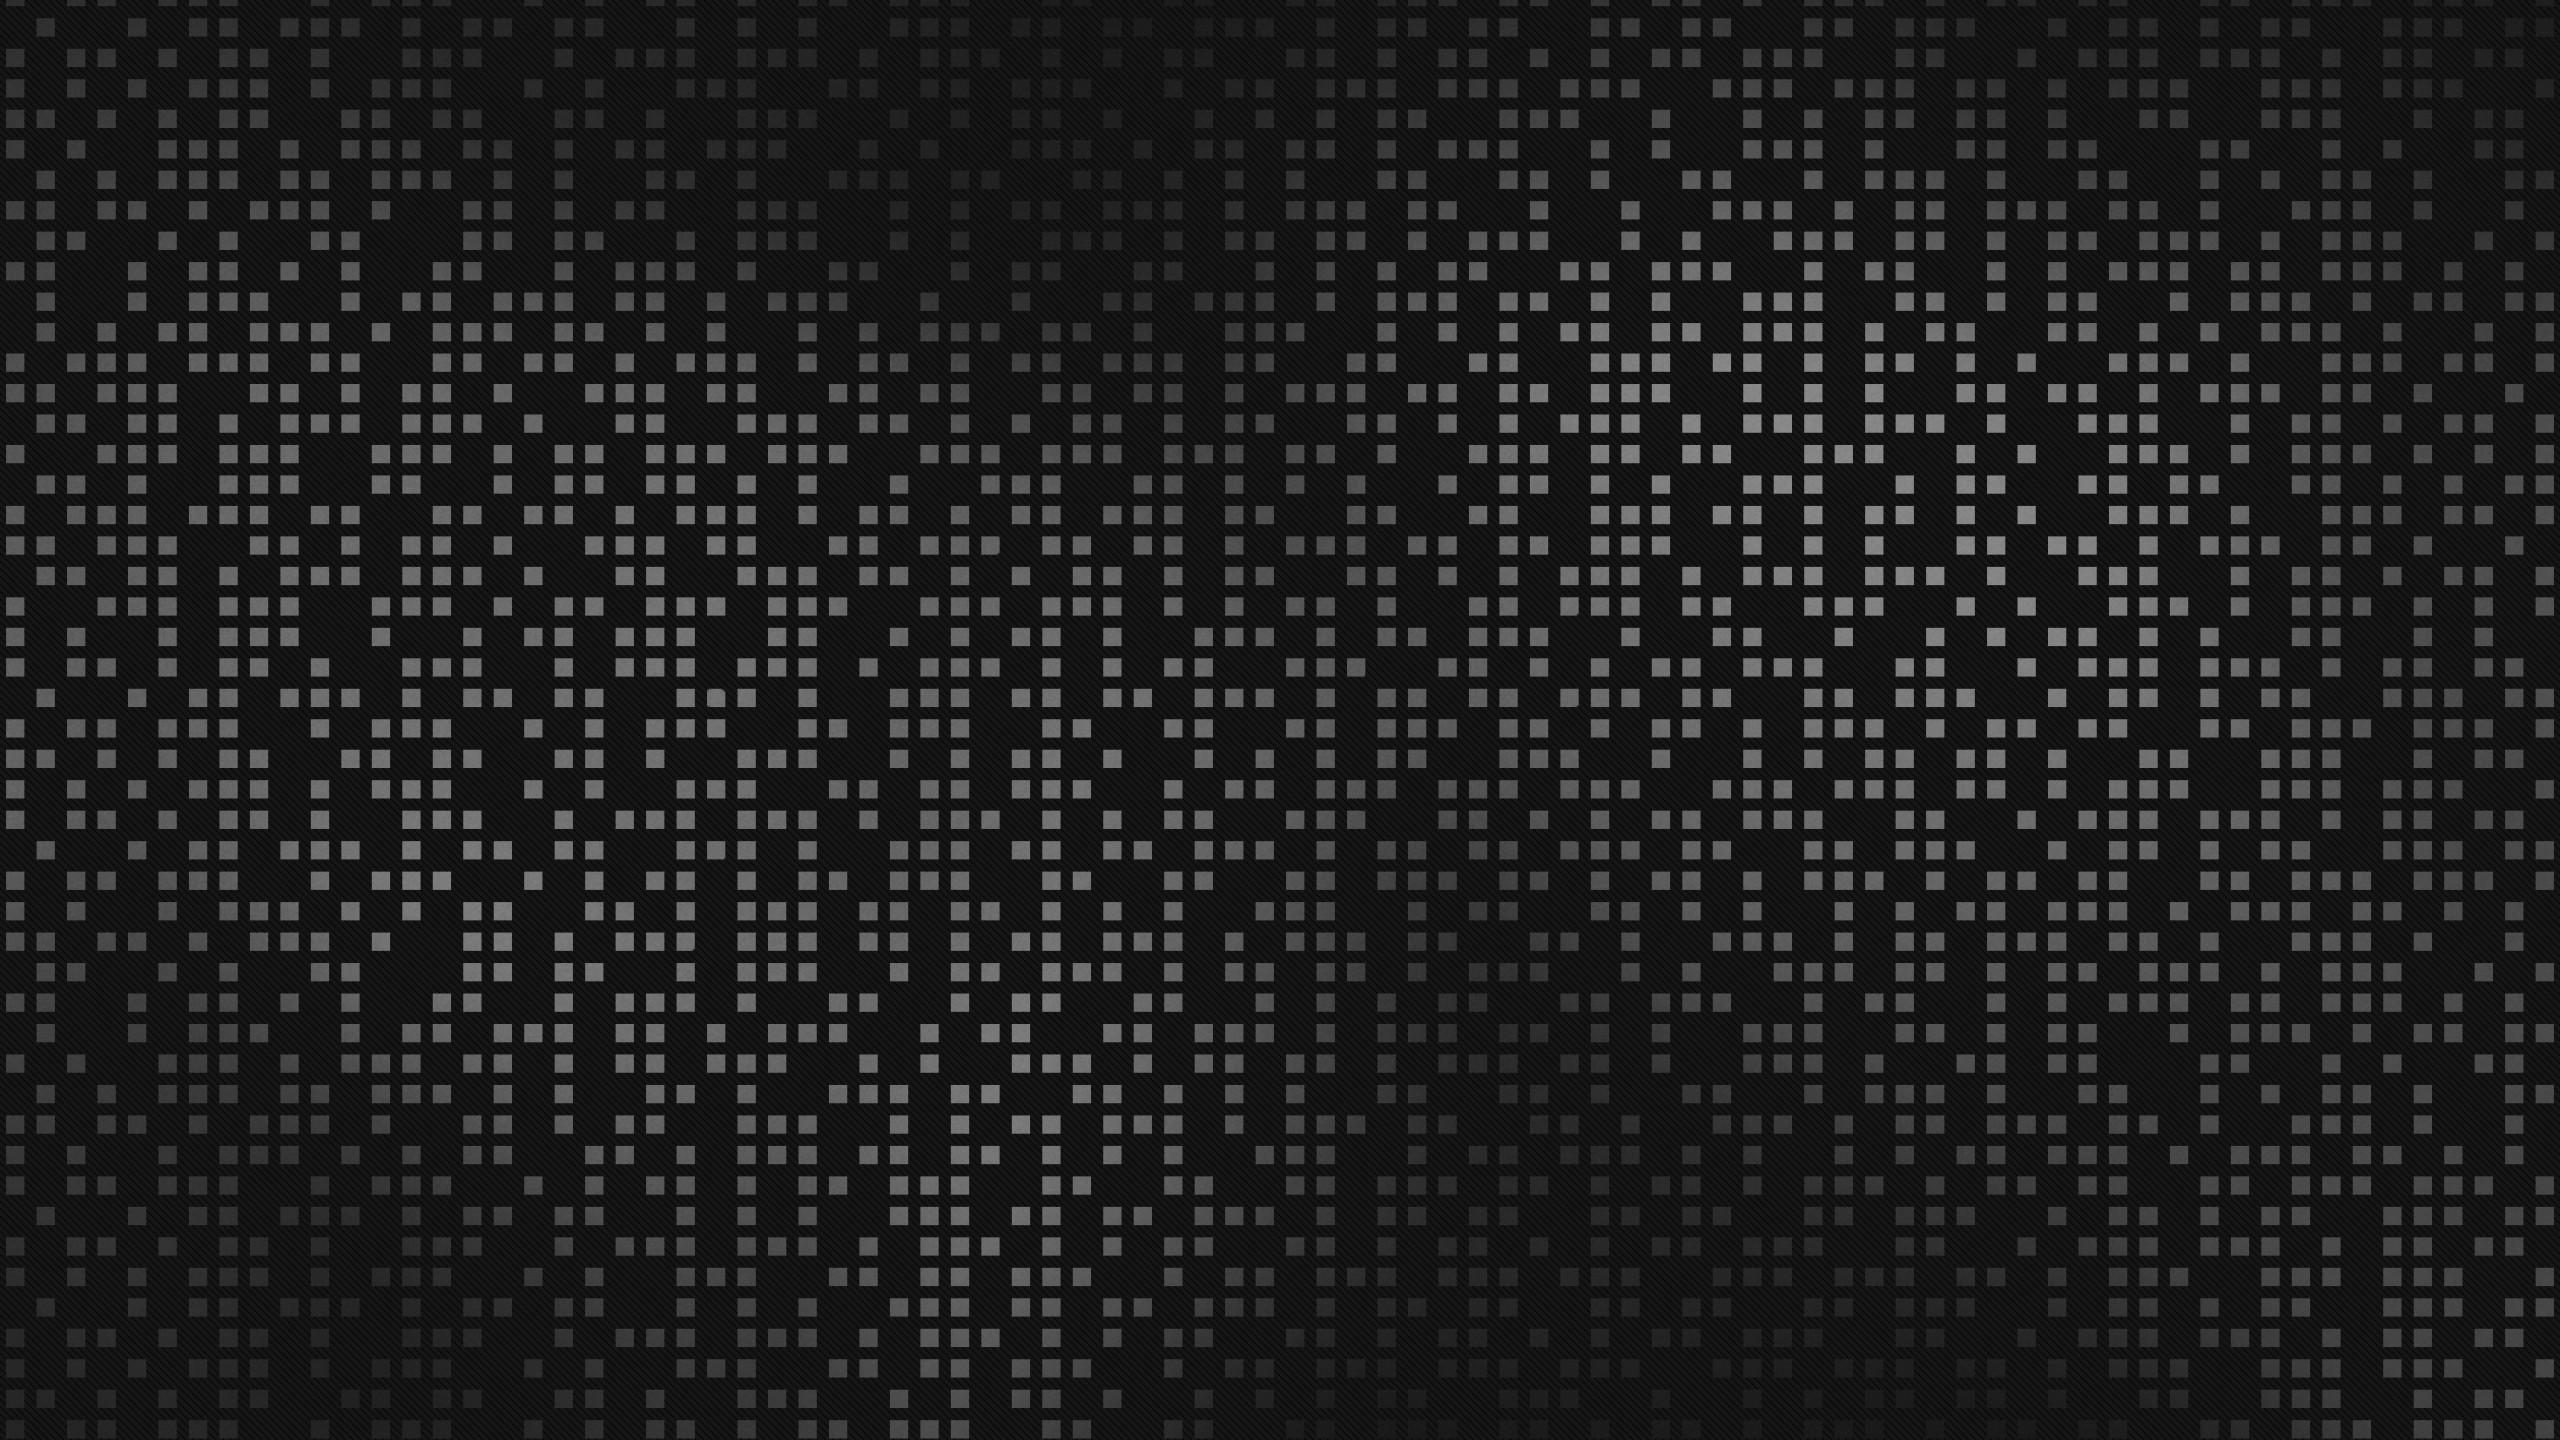 Wallpaper Phone Wallpapers #2760 Wallpaper   Wallpaperyup .